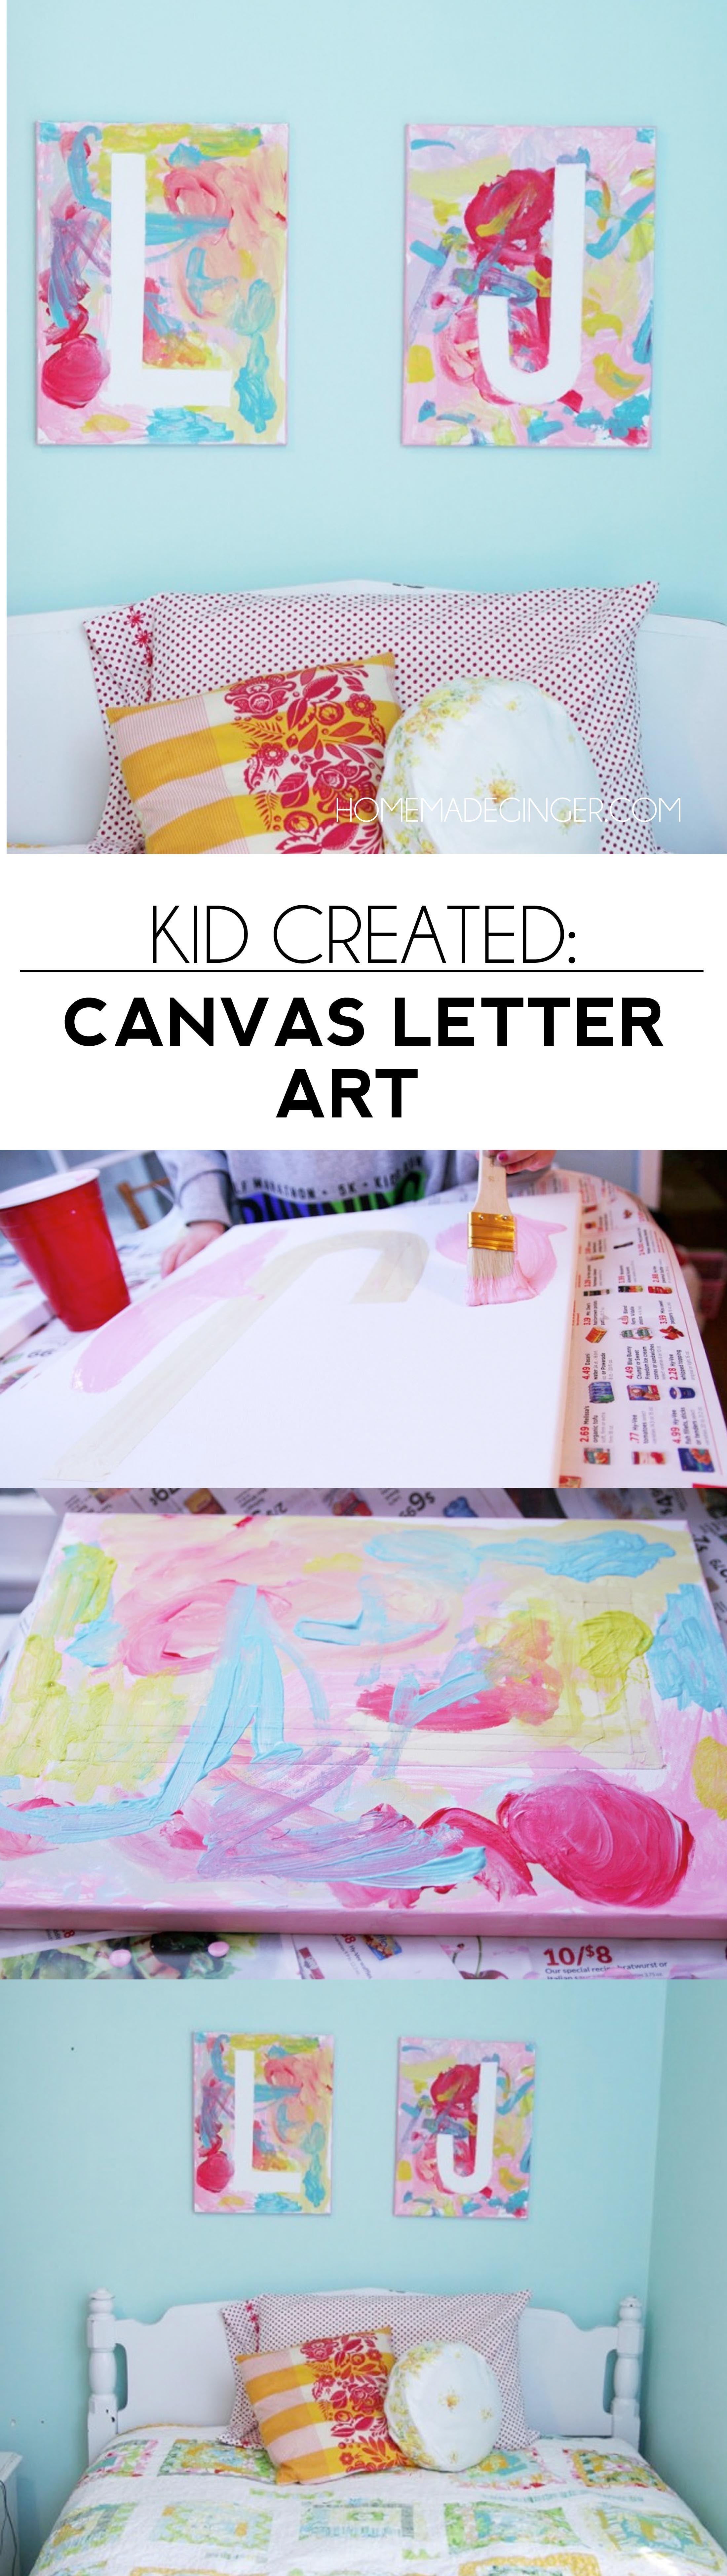 art project kid created canvas letter art diy ideas pinterest